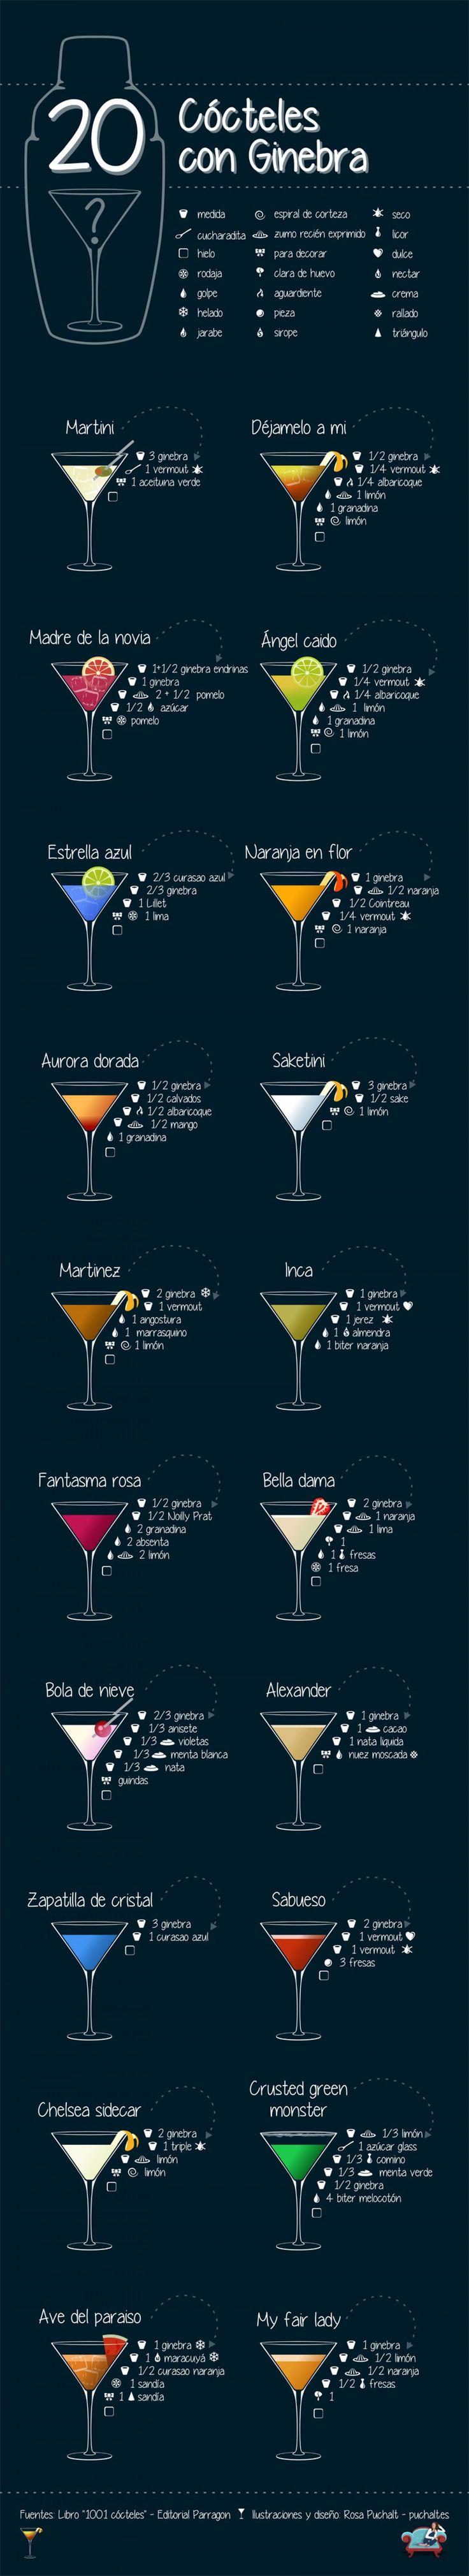 20 Cócteles con Ginebra Infographic